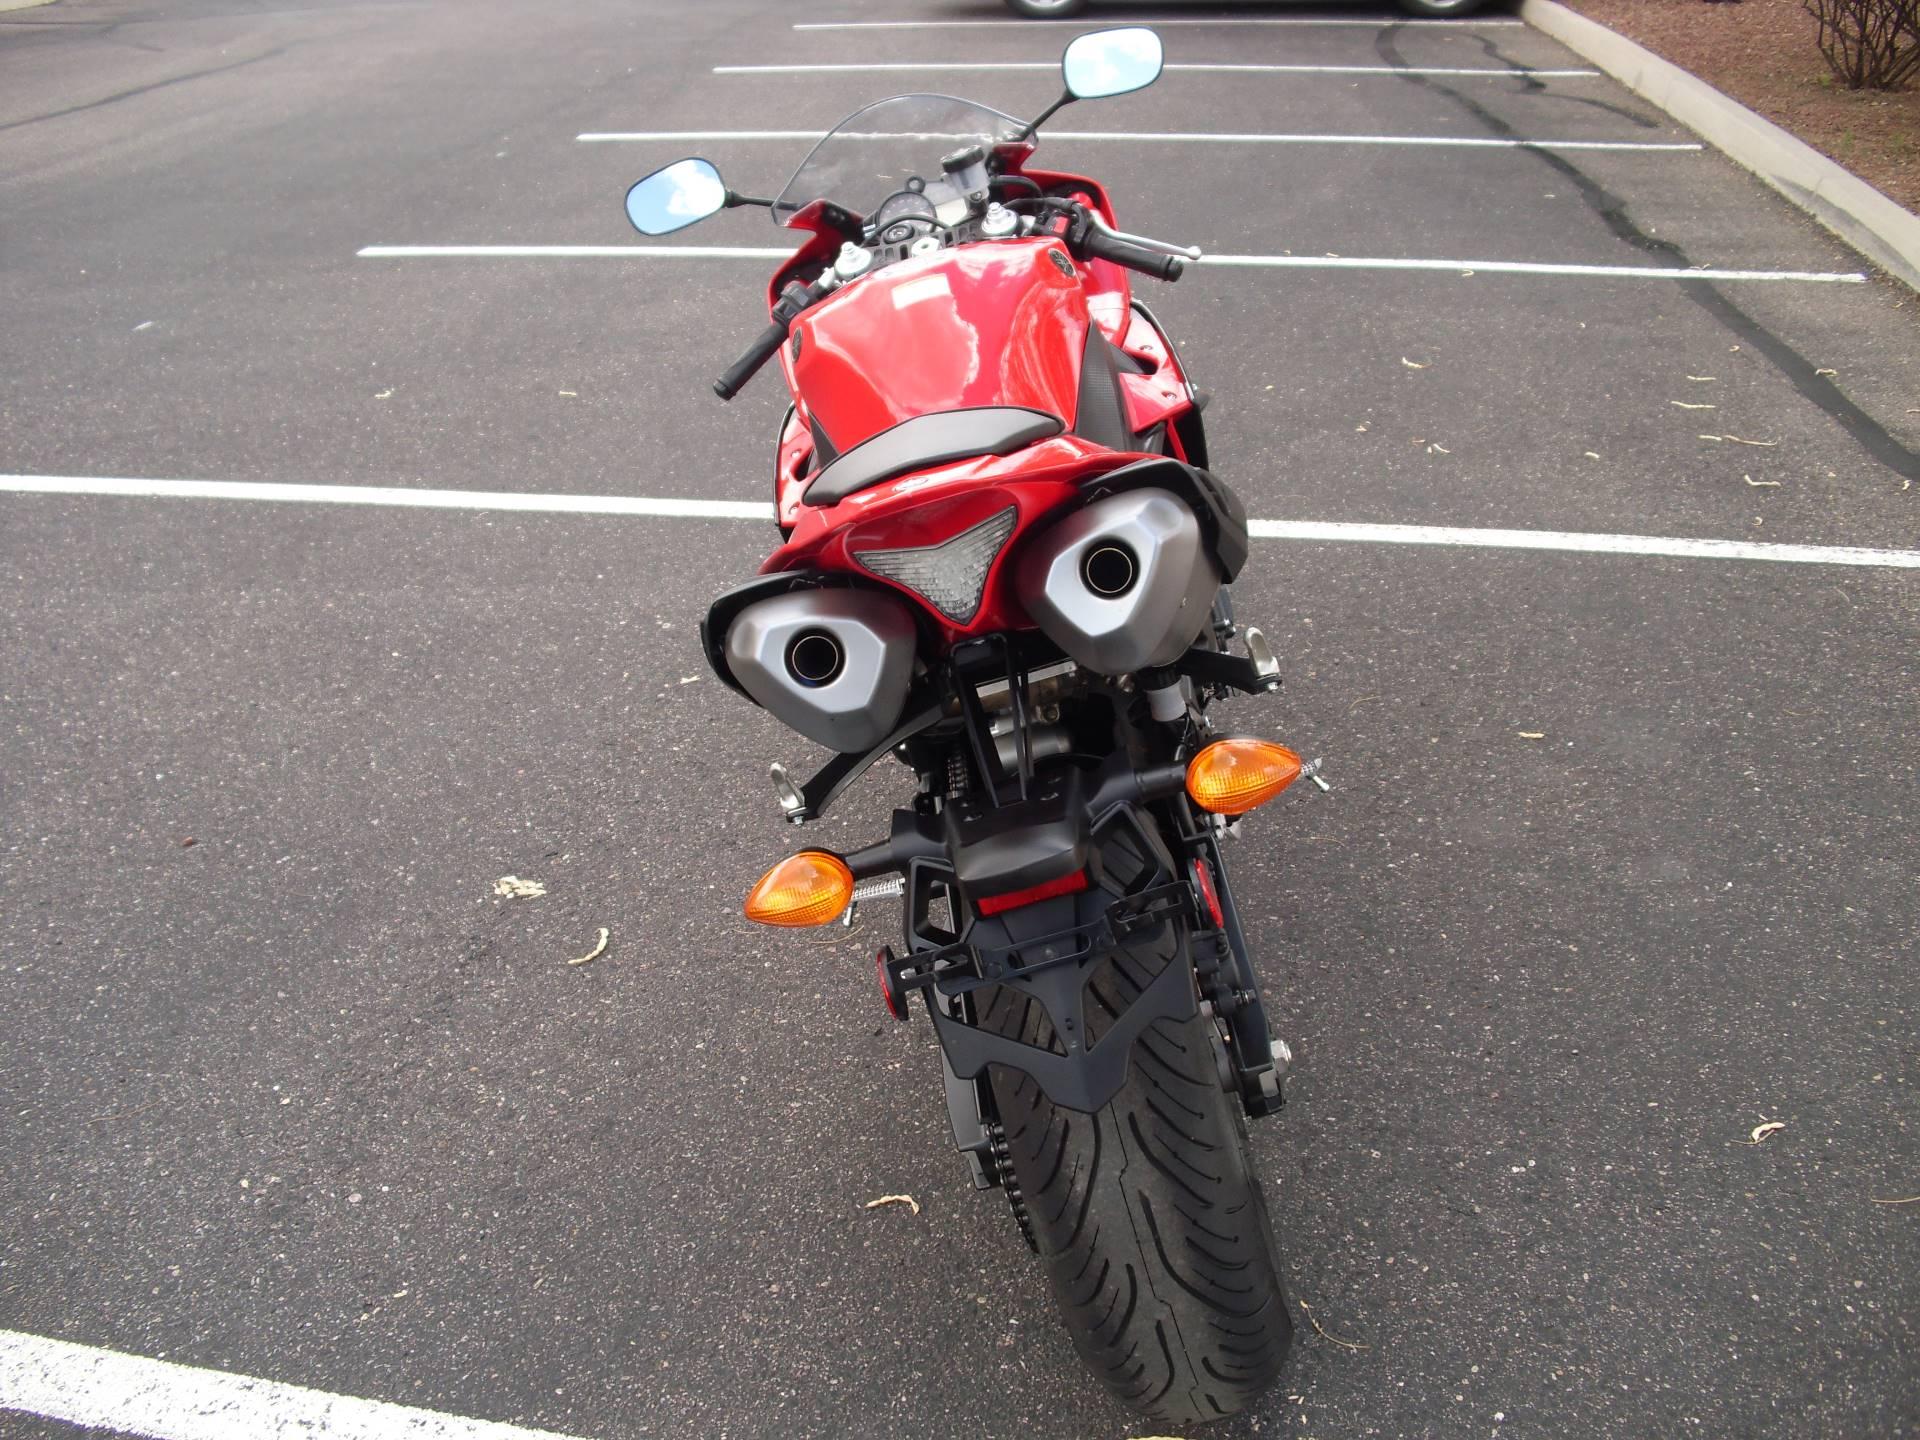 2013 Yamaha YZF-R1 3